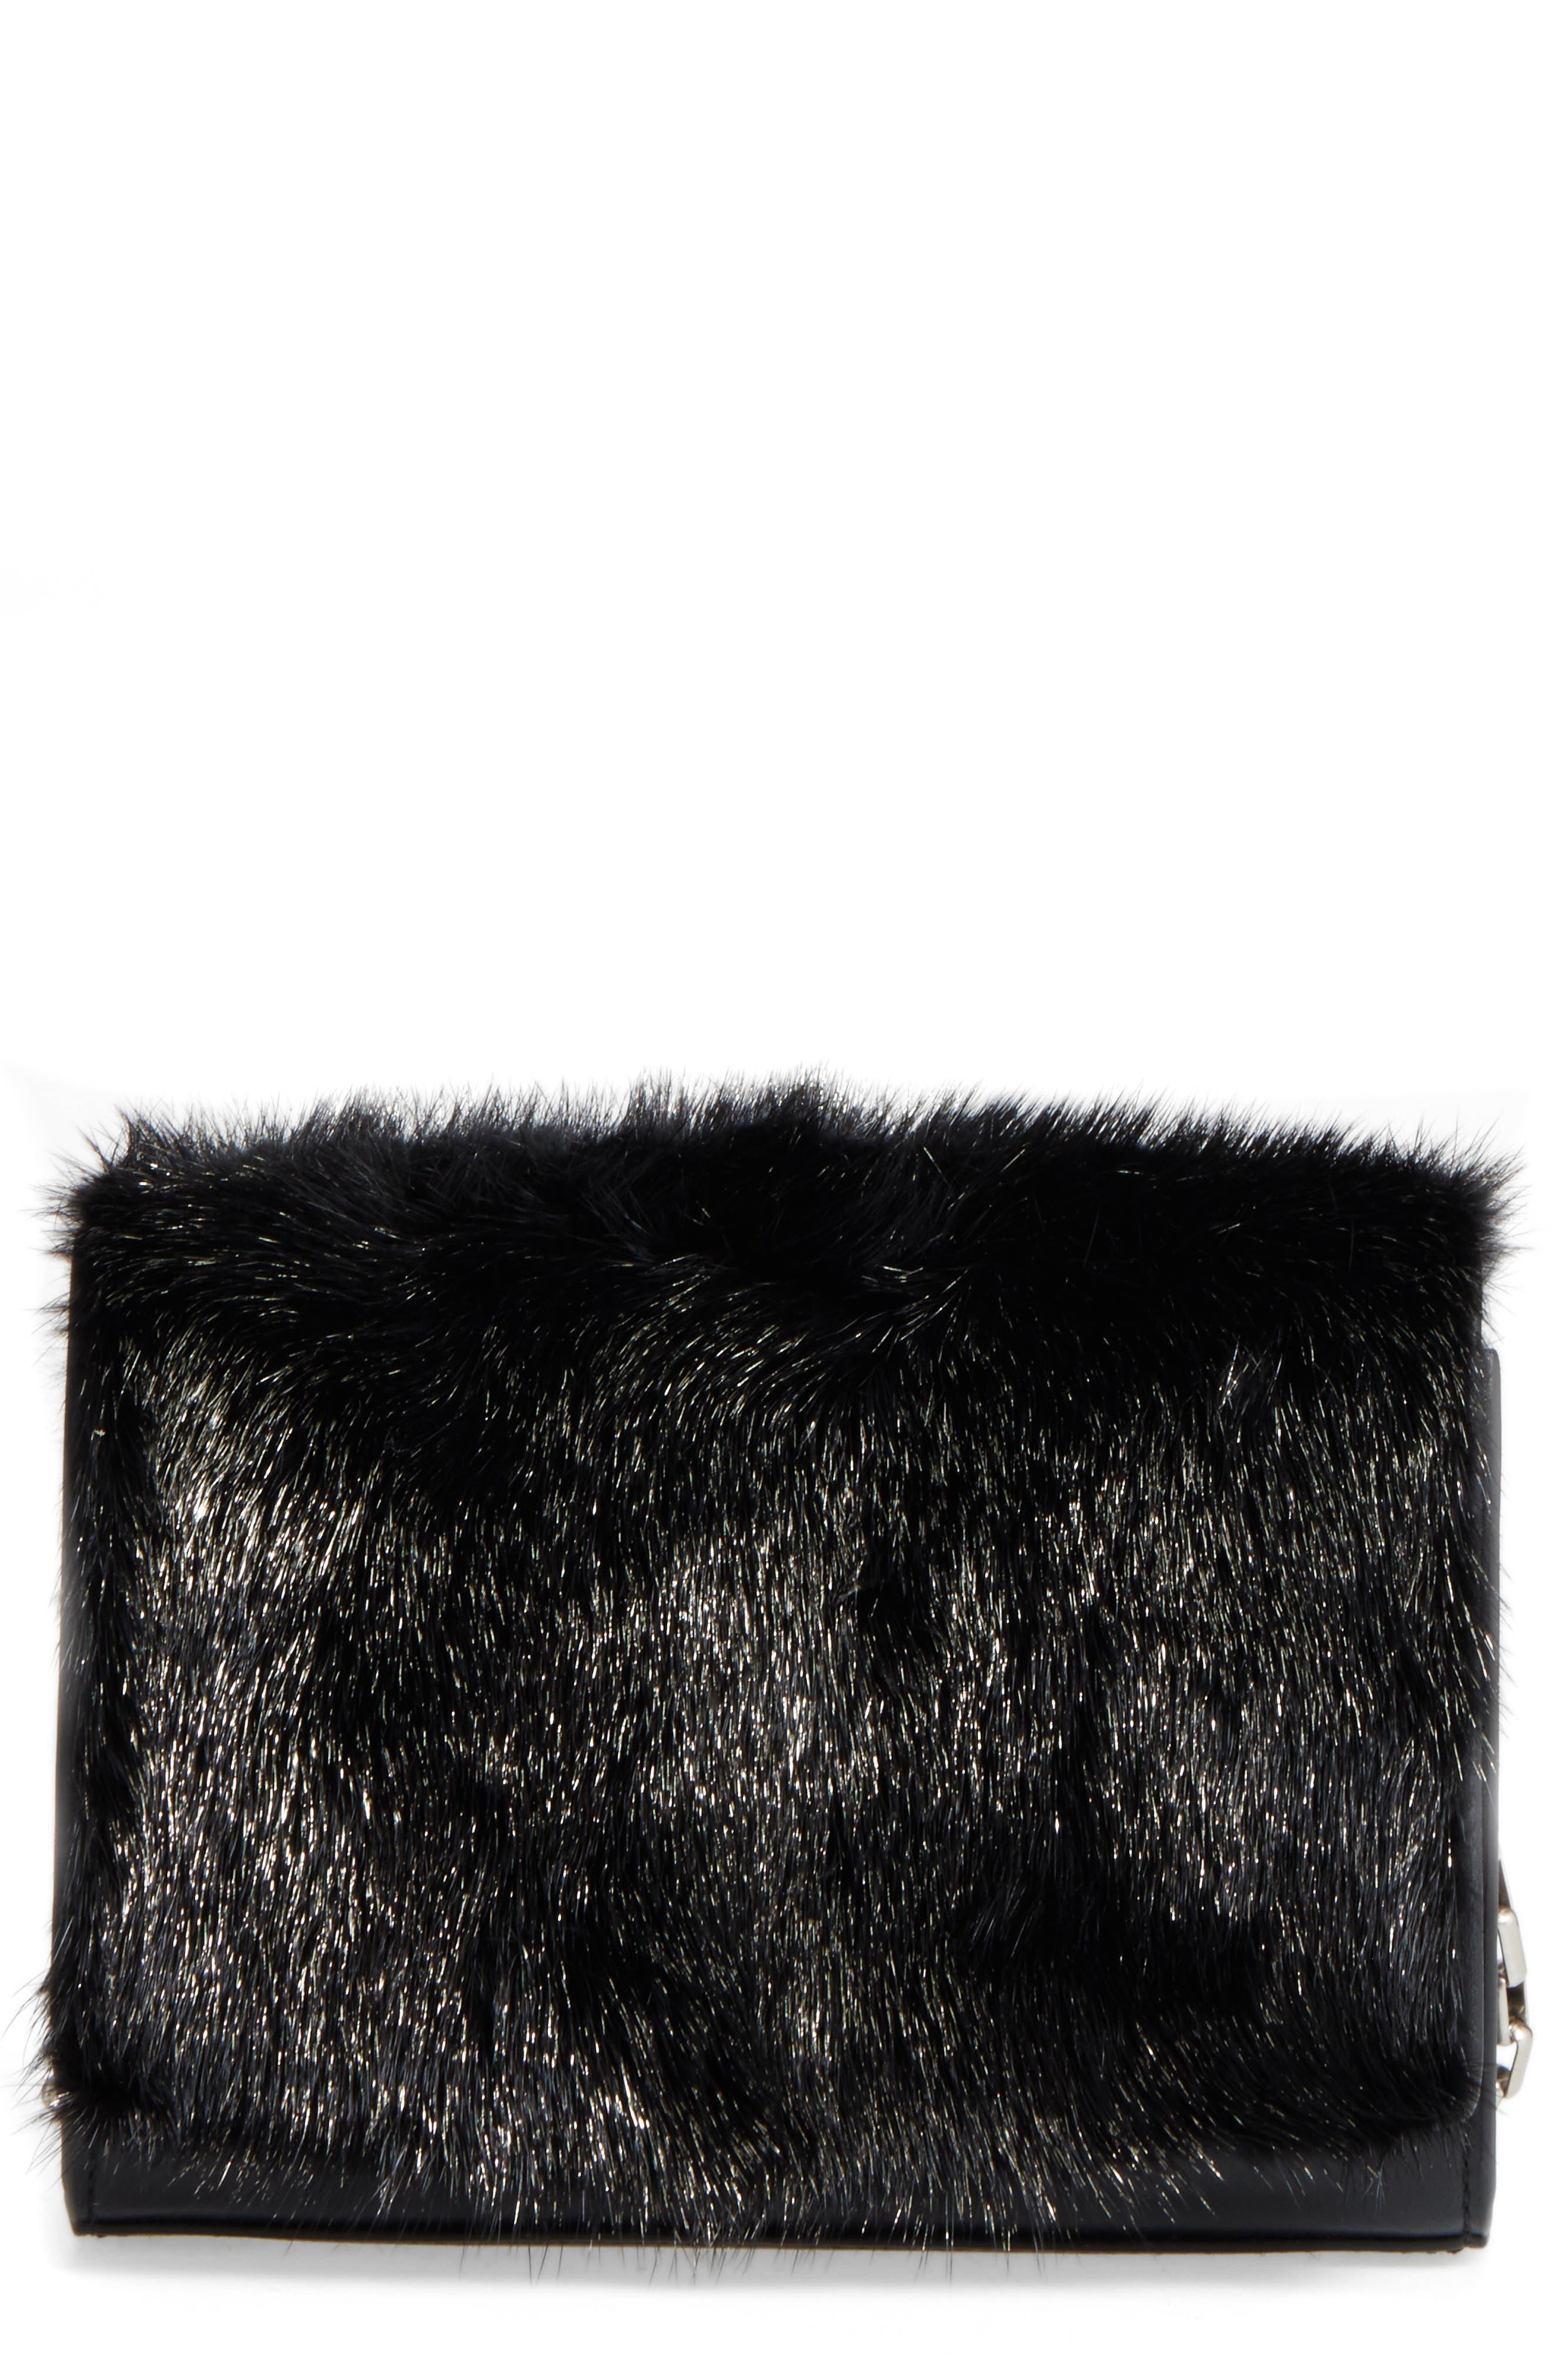 Yasmin Genuine Mink Fur Clutch,                             Main thumbnail 1, color,                             001